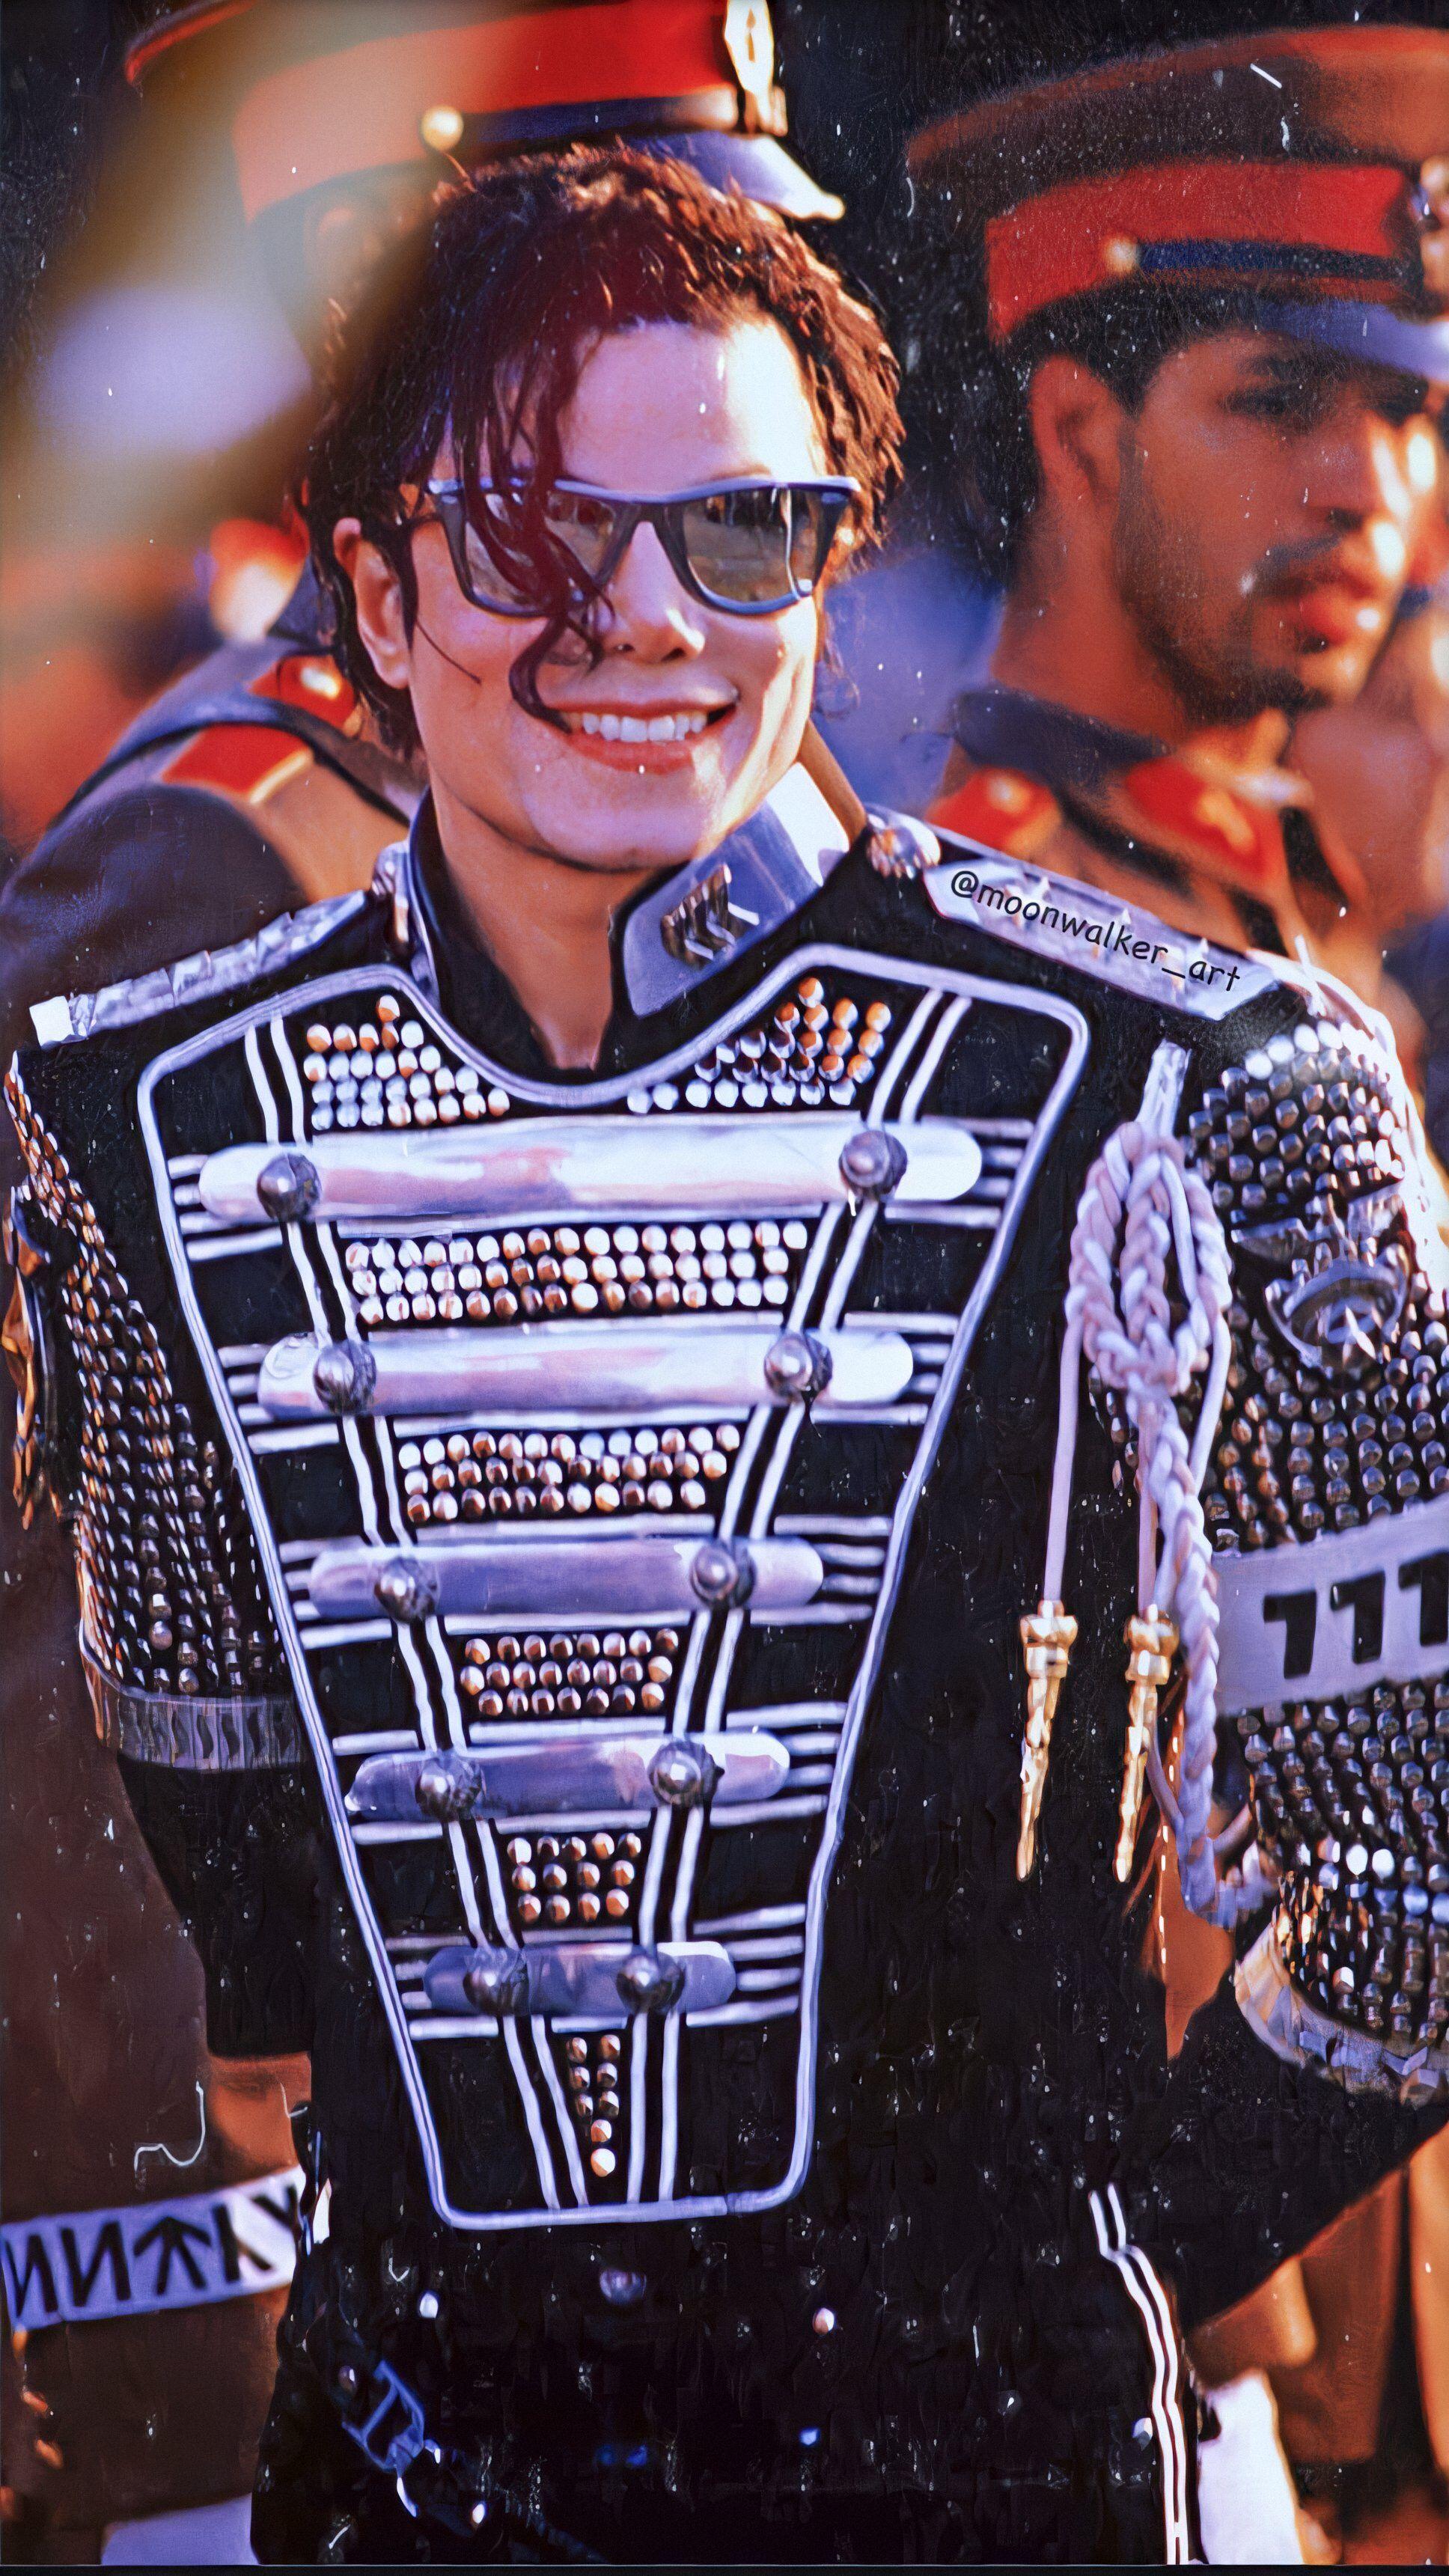 Pin De Camilly Teodoro Em Michael Jackson Michael Jackson